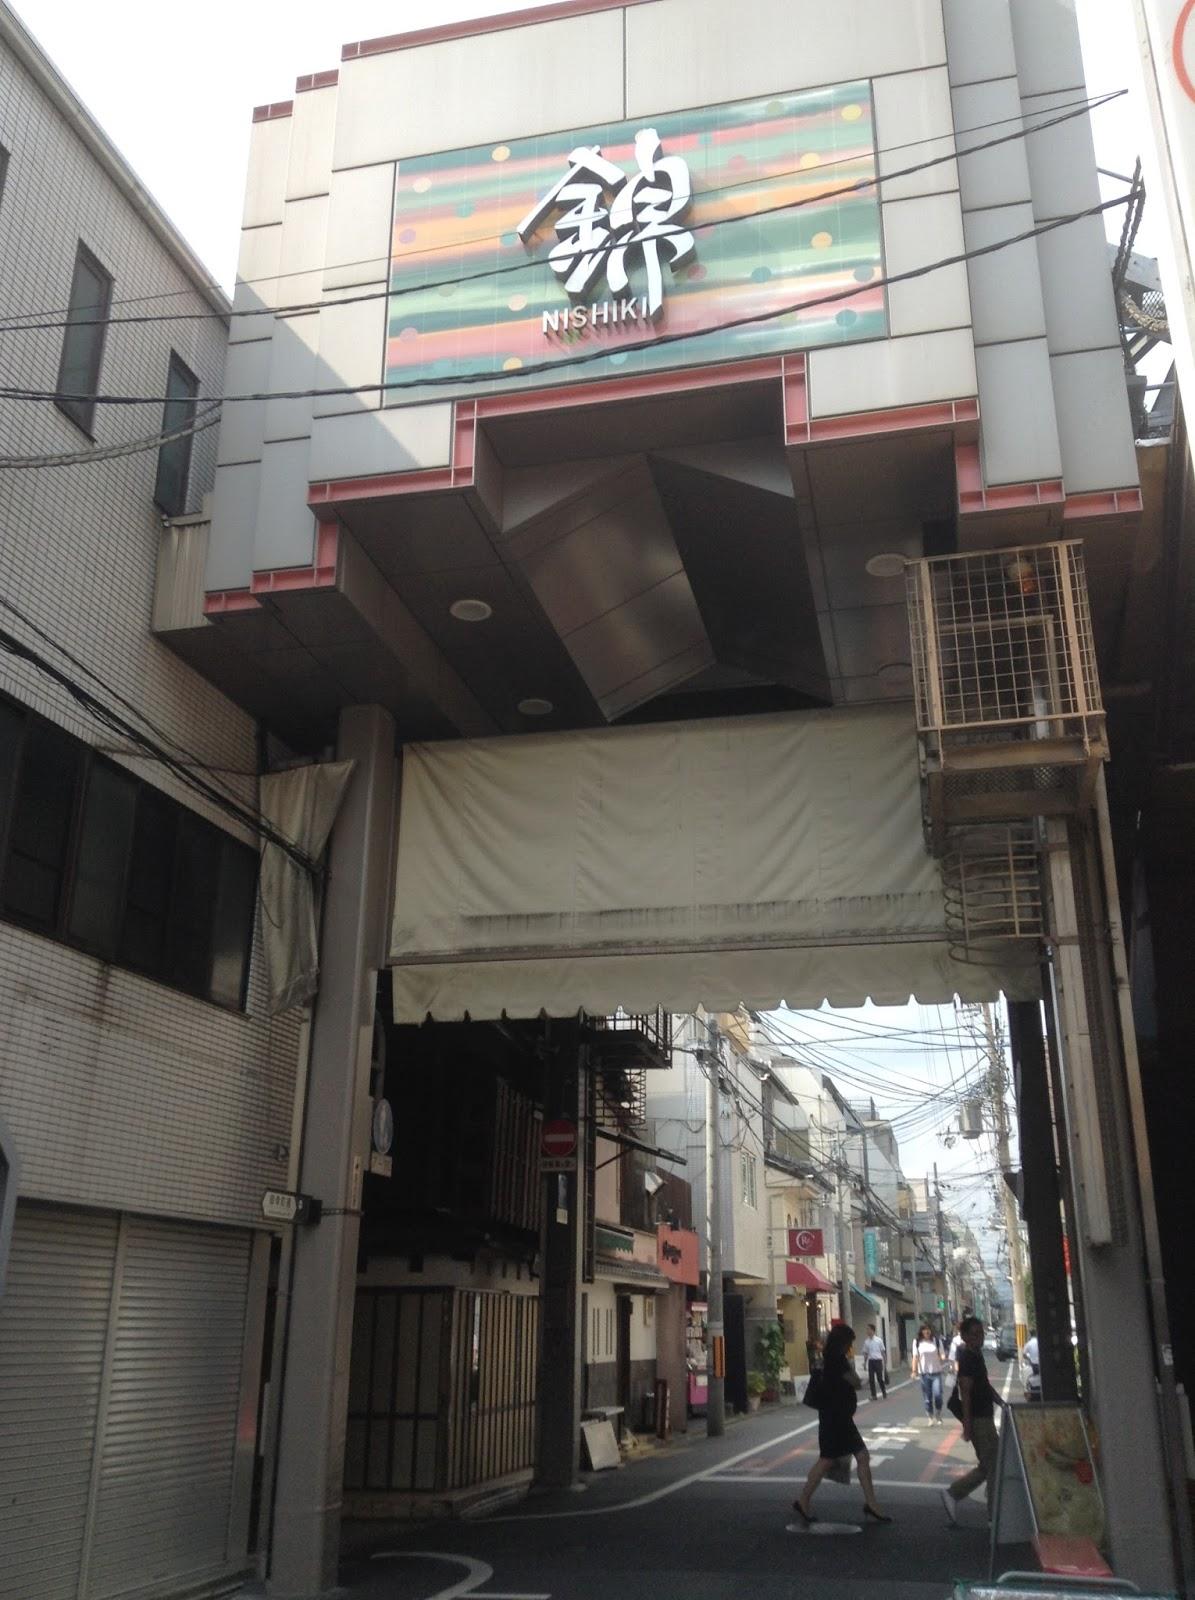 Nishiki market Kyoto Japanese street